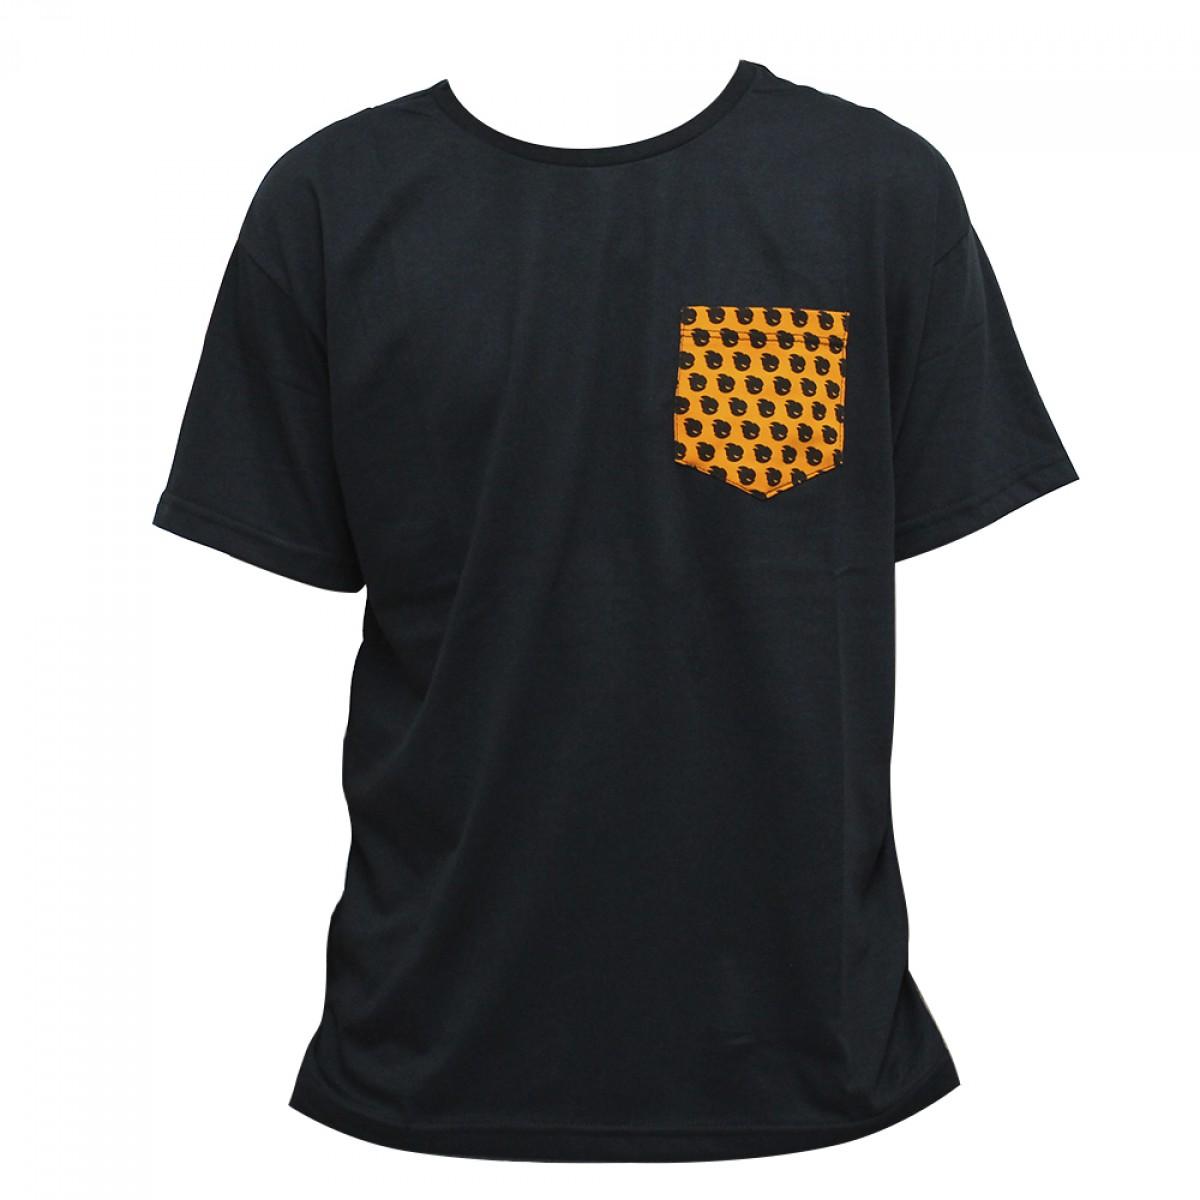 Camiseta Terabyteshop, Unisex, Manga Curta, Algodão, Preto e Laranja, Bolso (GG)